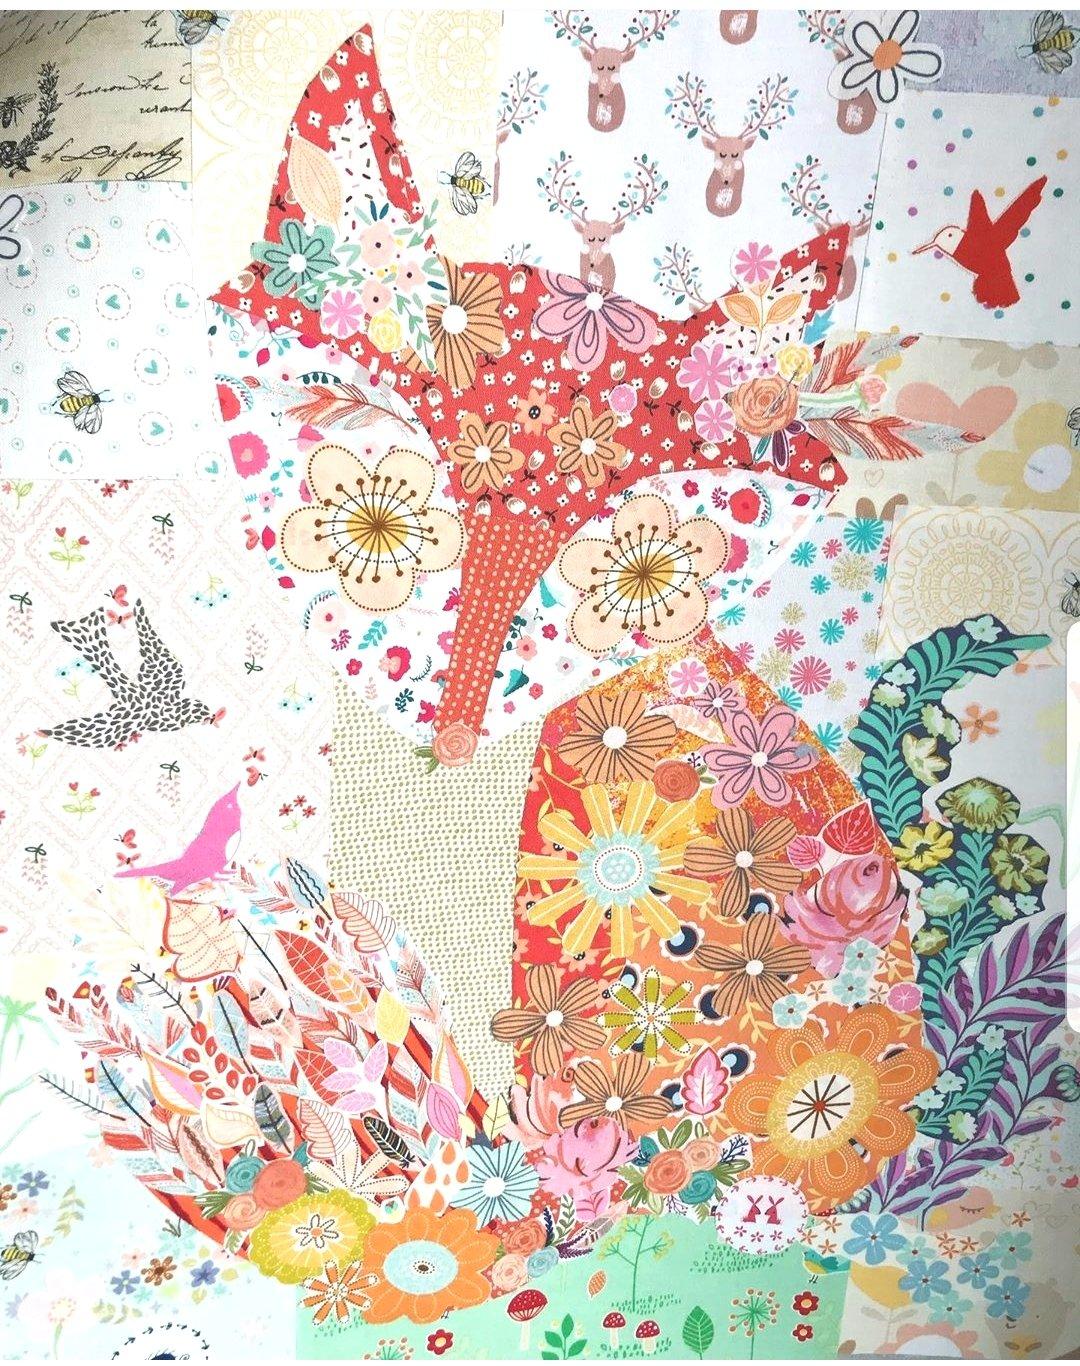 Fox Collage Fabric Kit -- Teeny Tiny Collage